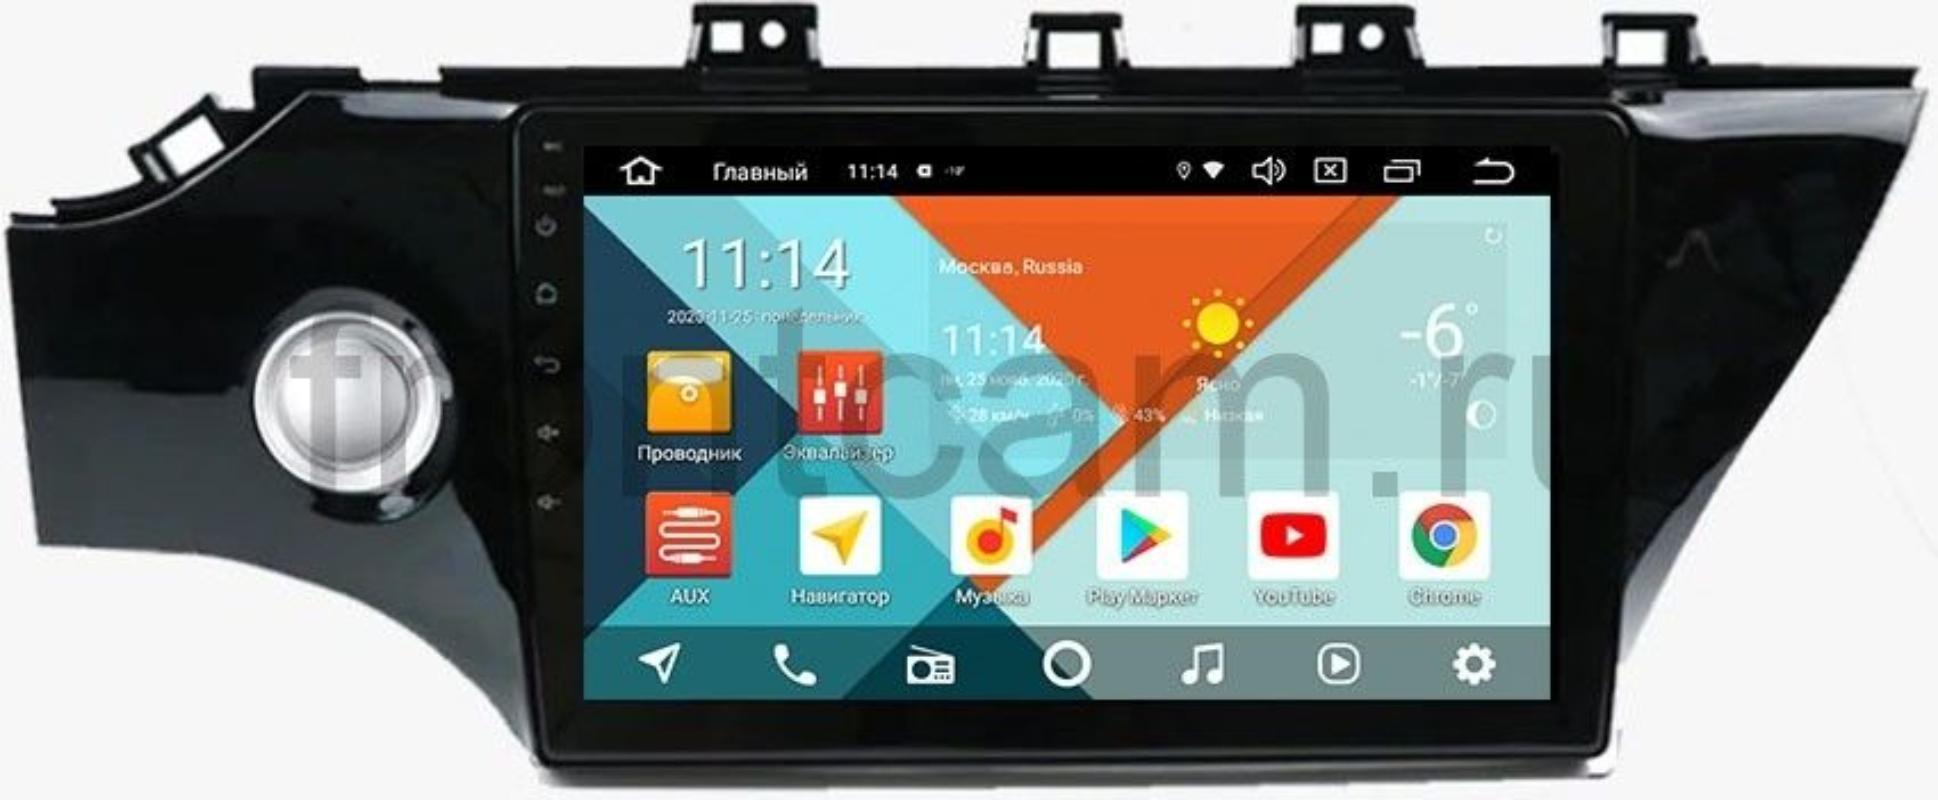 Штатная магнитола Kia Rio IV, Rio IV X-Line 2017-2019 Wide Media KS10-419QR-3/32 DSP CarPlay 4G-SIM на Android 10 (с кнопкой) (+ Камера заднего вида в подарок!)